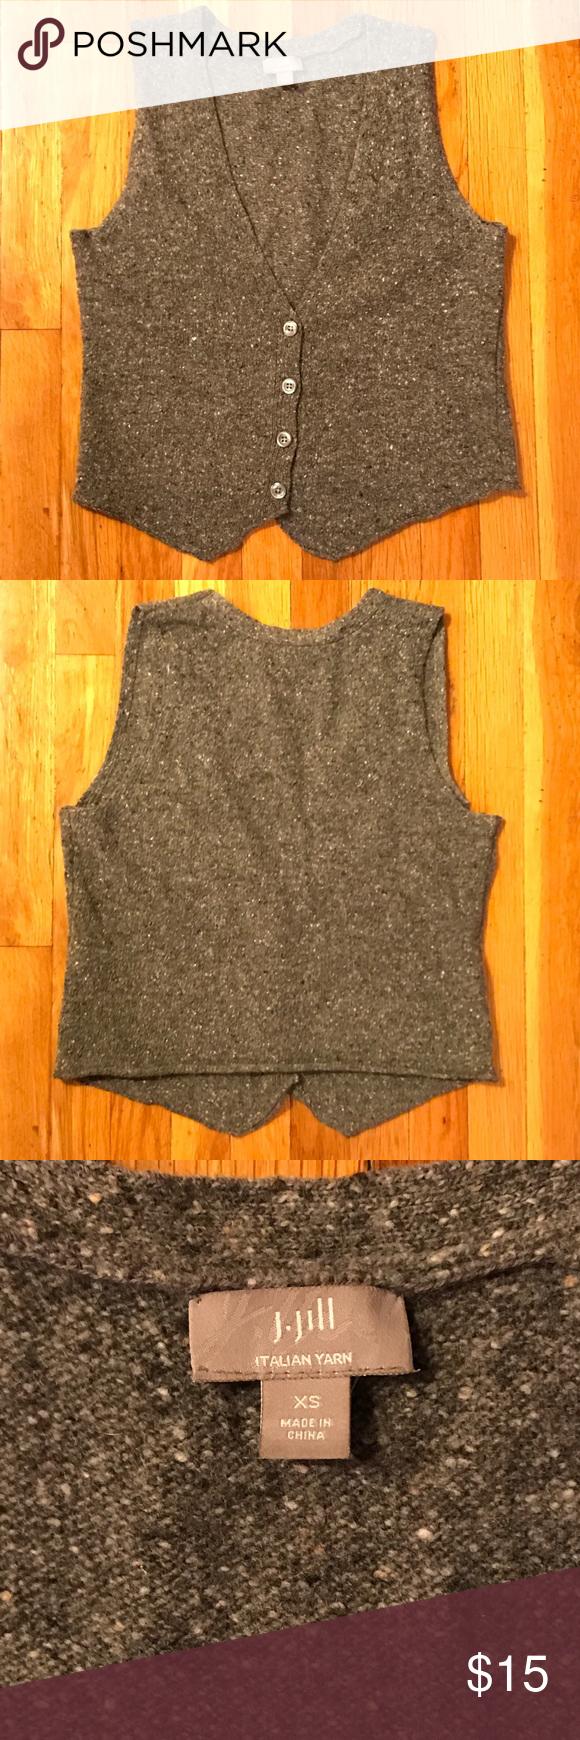 J. Jill Womens Button Up Knit Sweater Vest Size XS J. Jill Women's ...